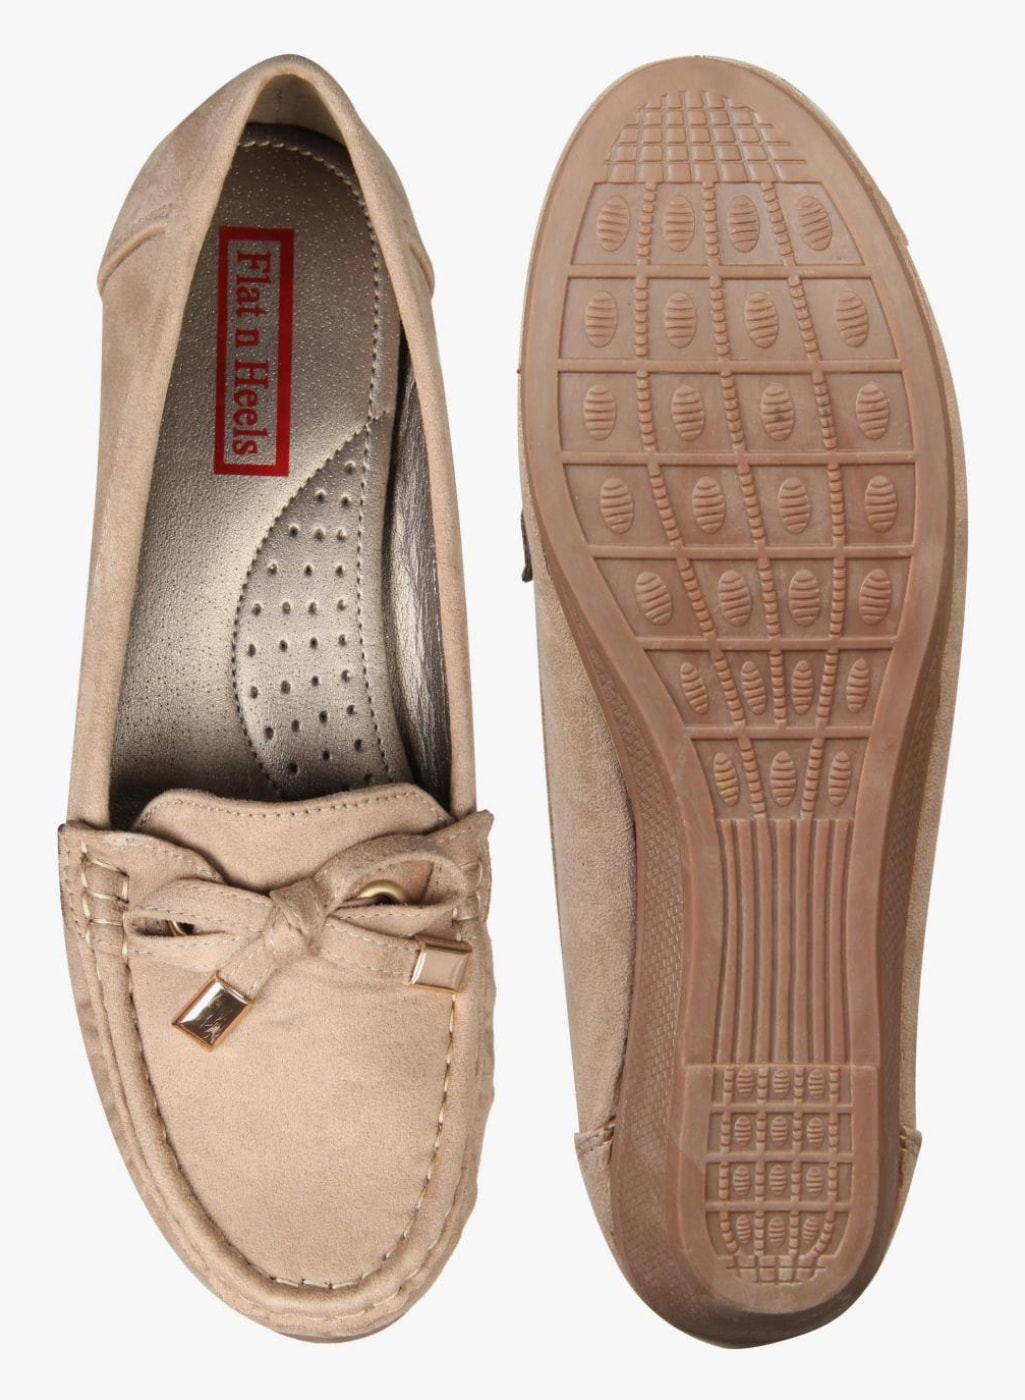 0886591c910 Flat n Heels Khaki Belly Shoes